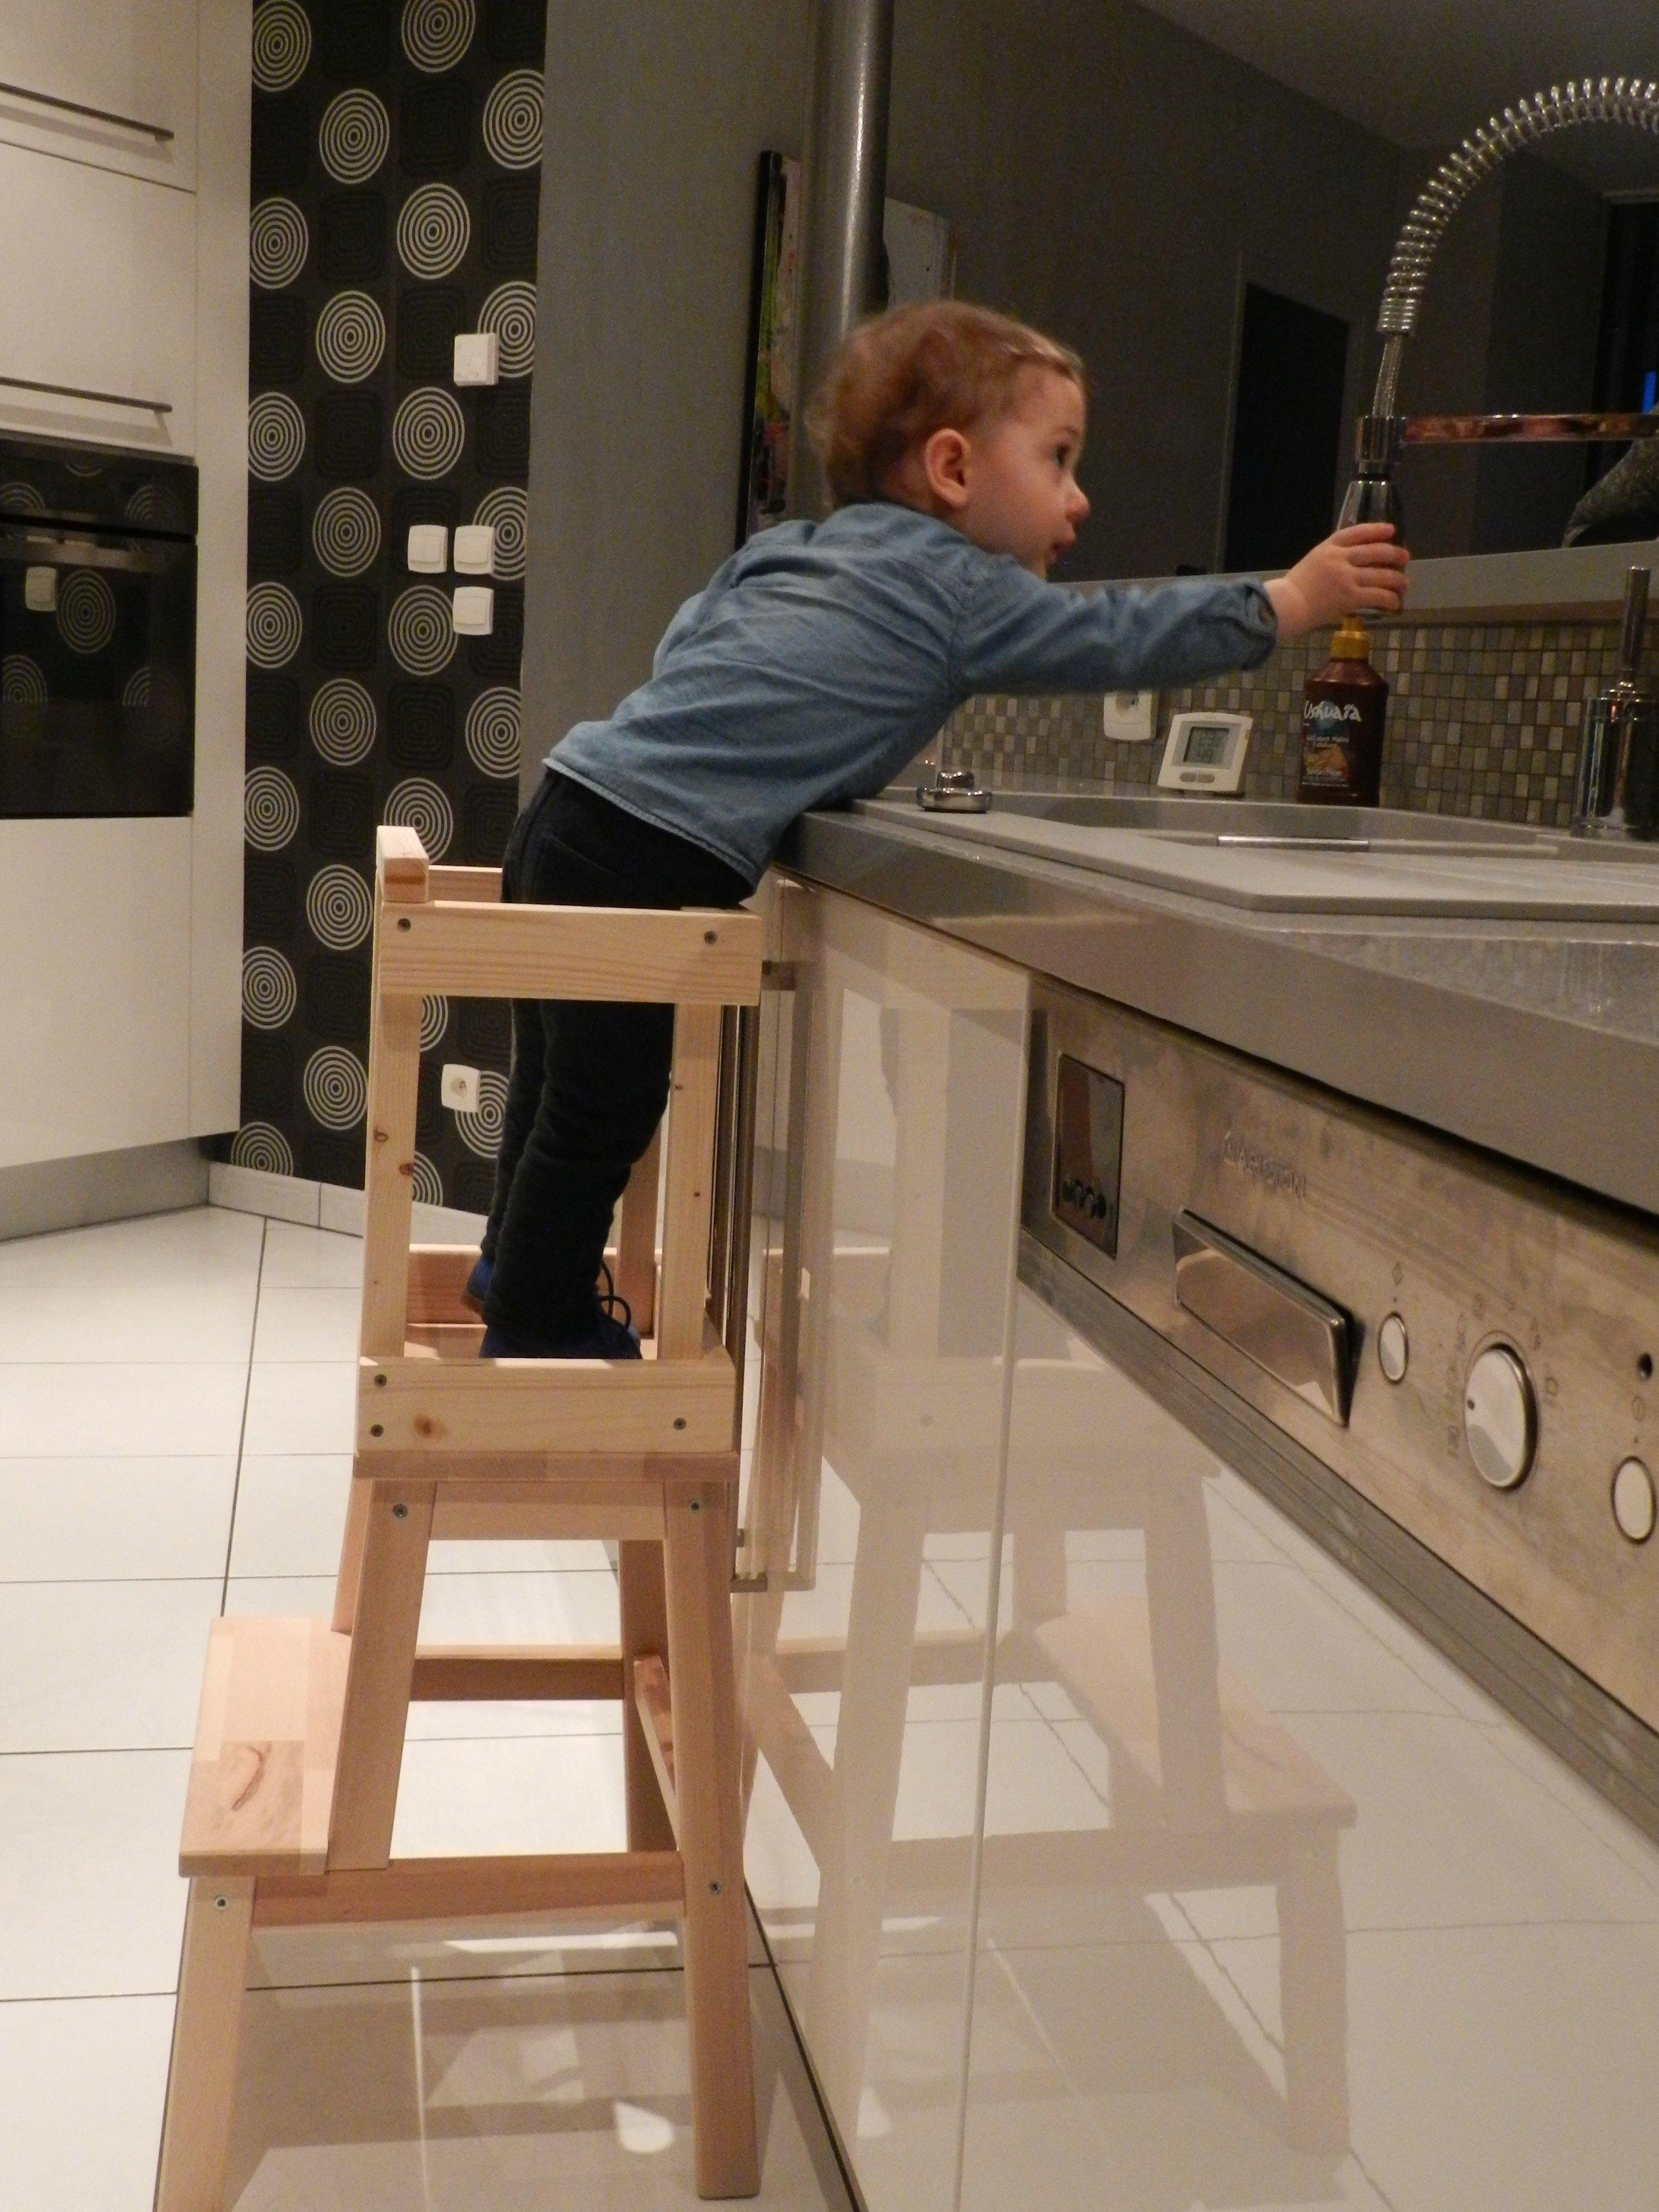 tour d 39 observation montessori fabrication tape par tape montessori pinterest tabouret. Black Bedroom Furniture Sets. Home Design Ideas